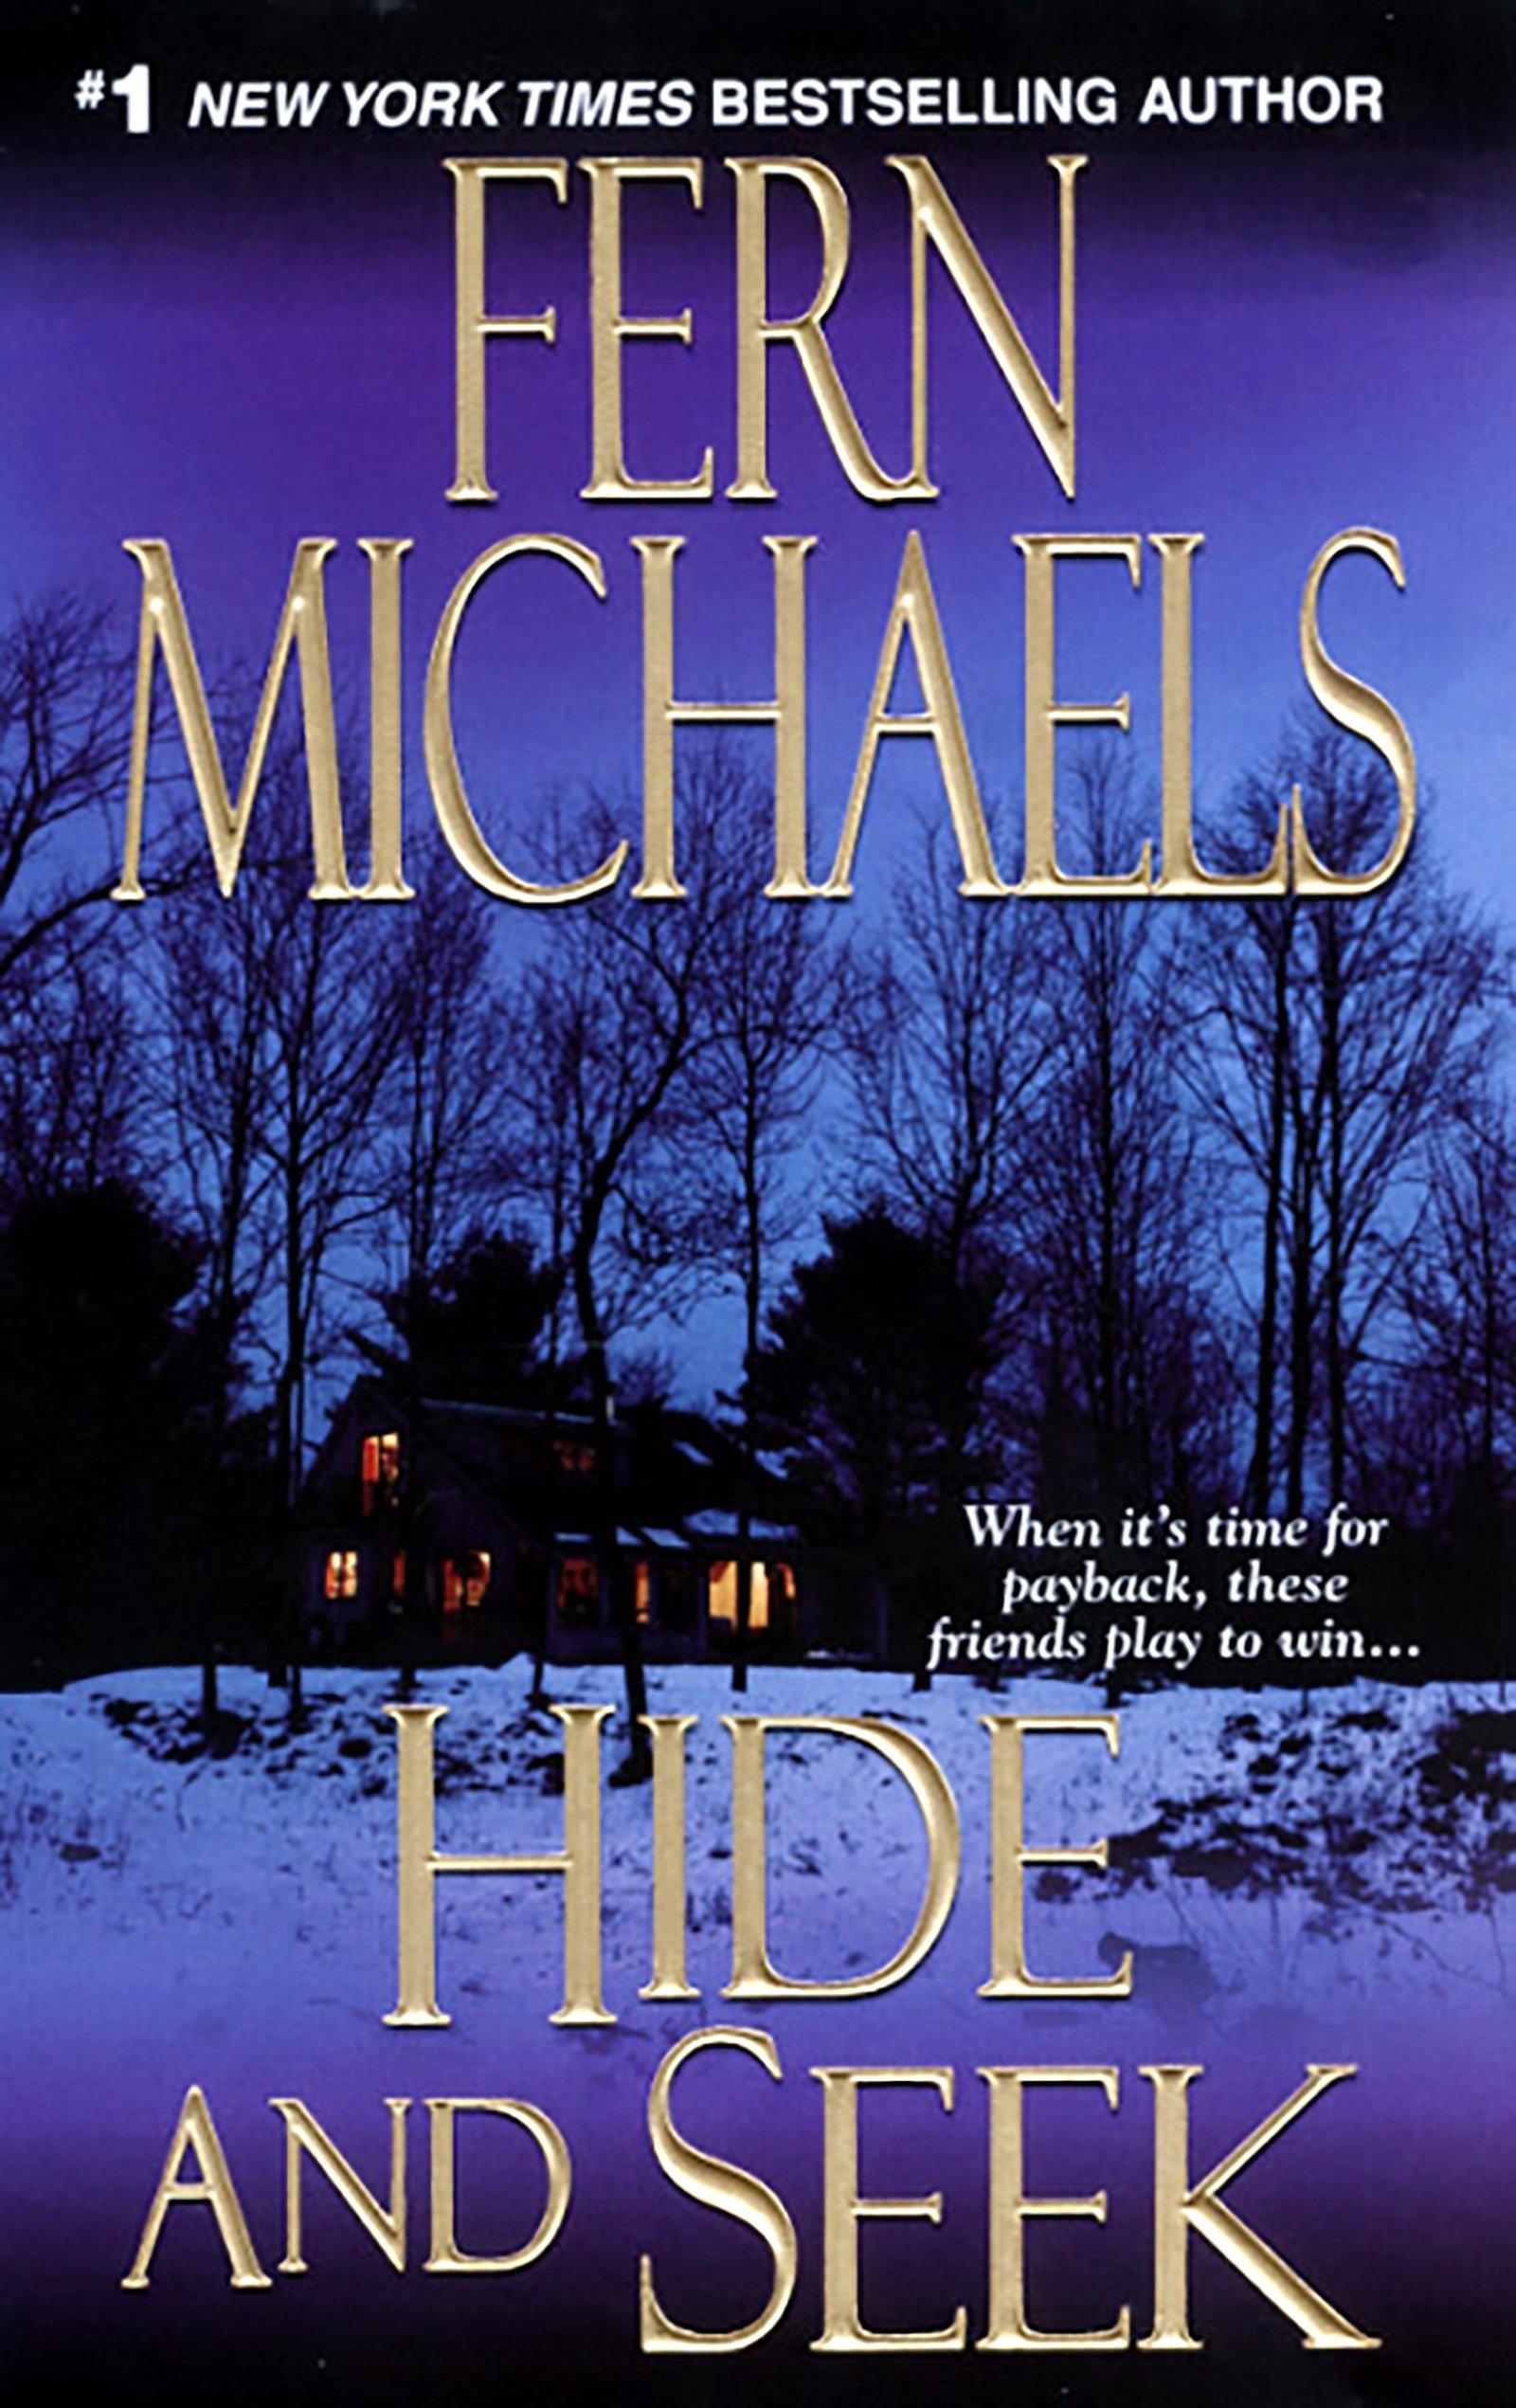 Hide and Seek (The Sisterhood: Rules of the Game, Book 1): Fern Michaels:  9781420101843: Amazon.com: Books